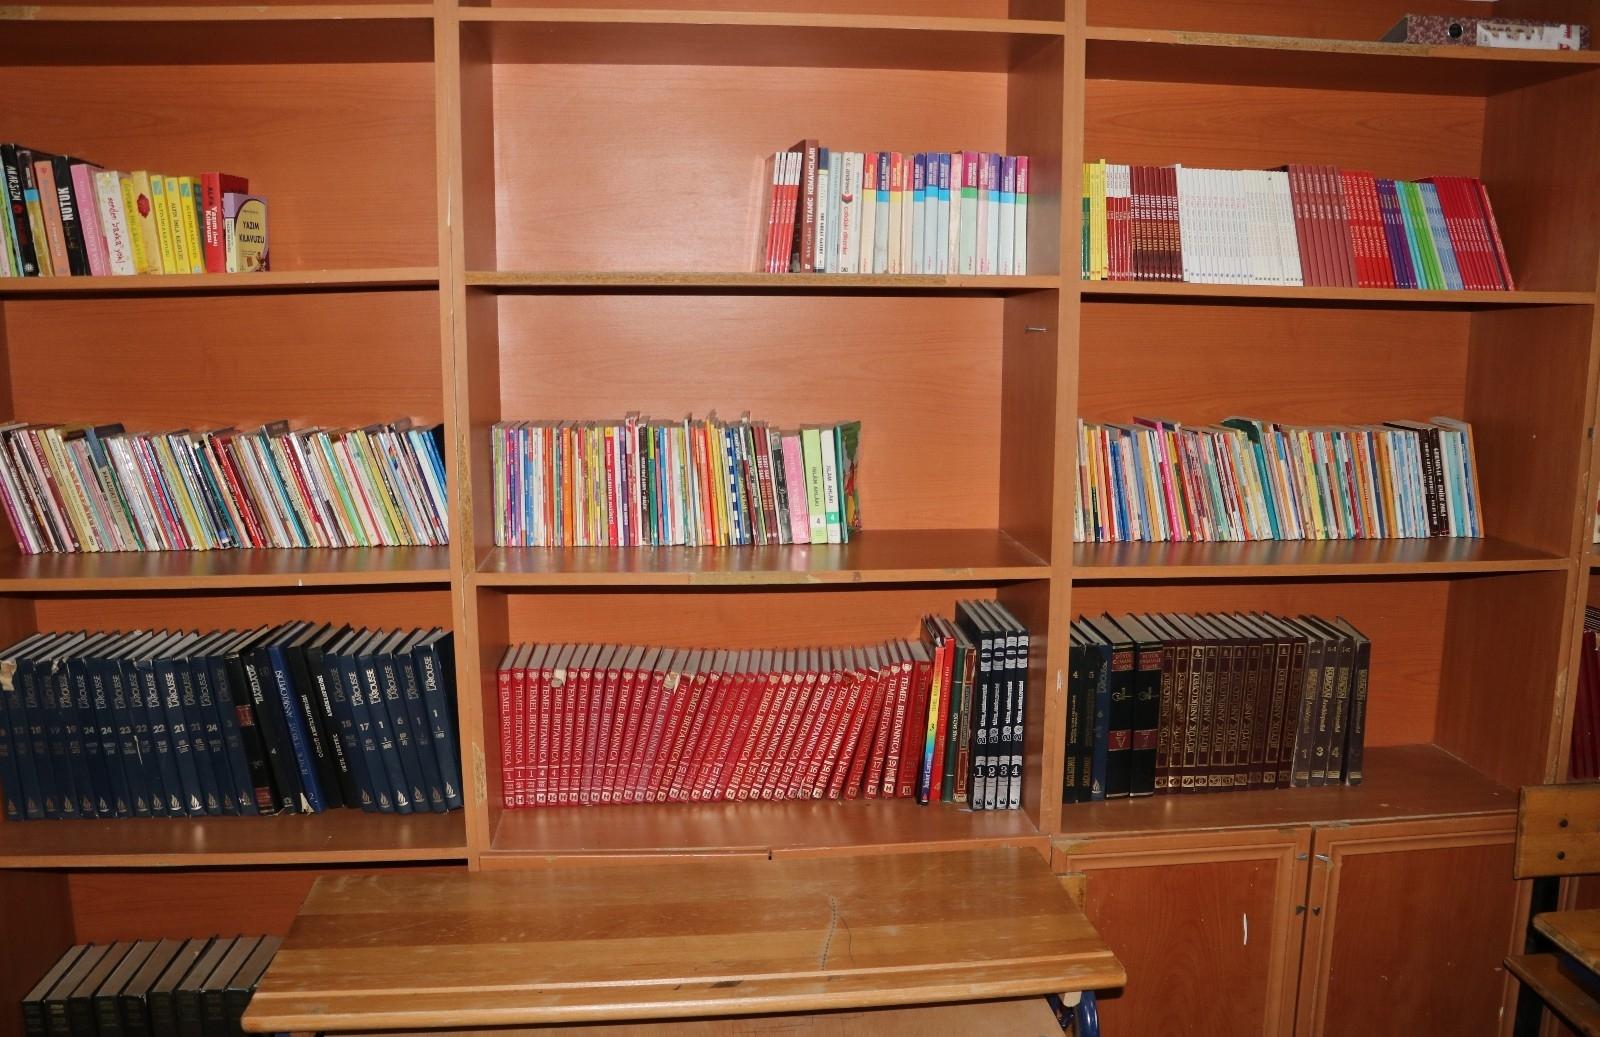 2021/06/okul-mudiresi-atandigi-harabe-koy-okuluna-adeta-hayat-verdi-20210610AW34-19.jpg